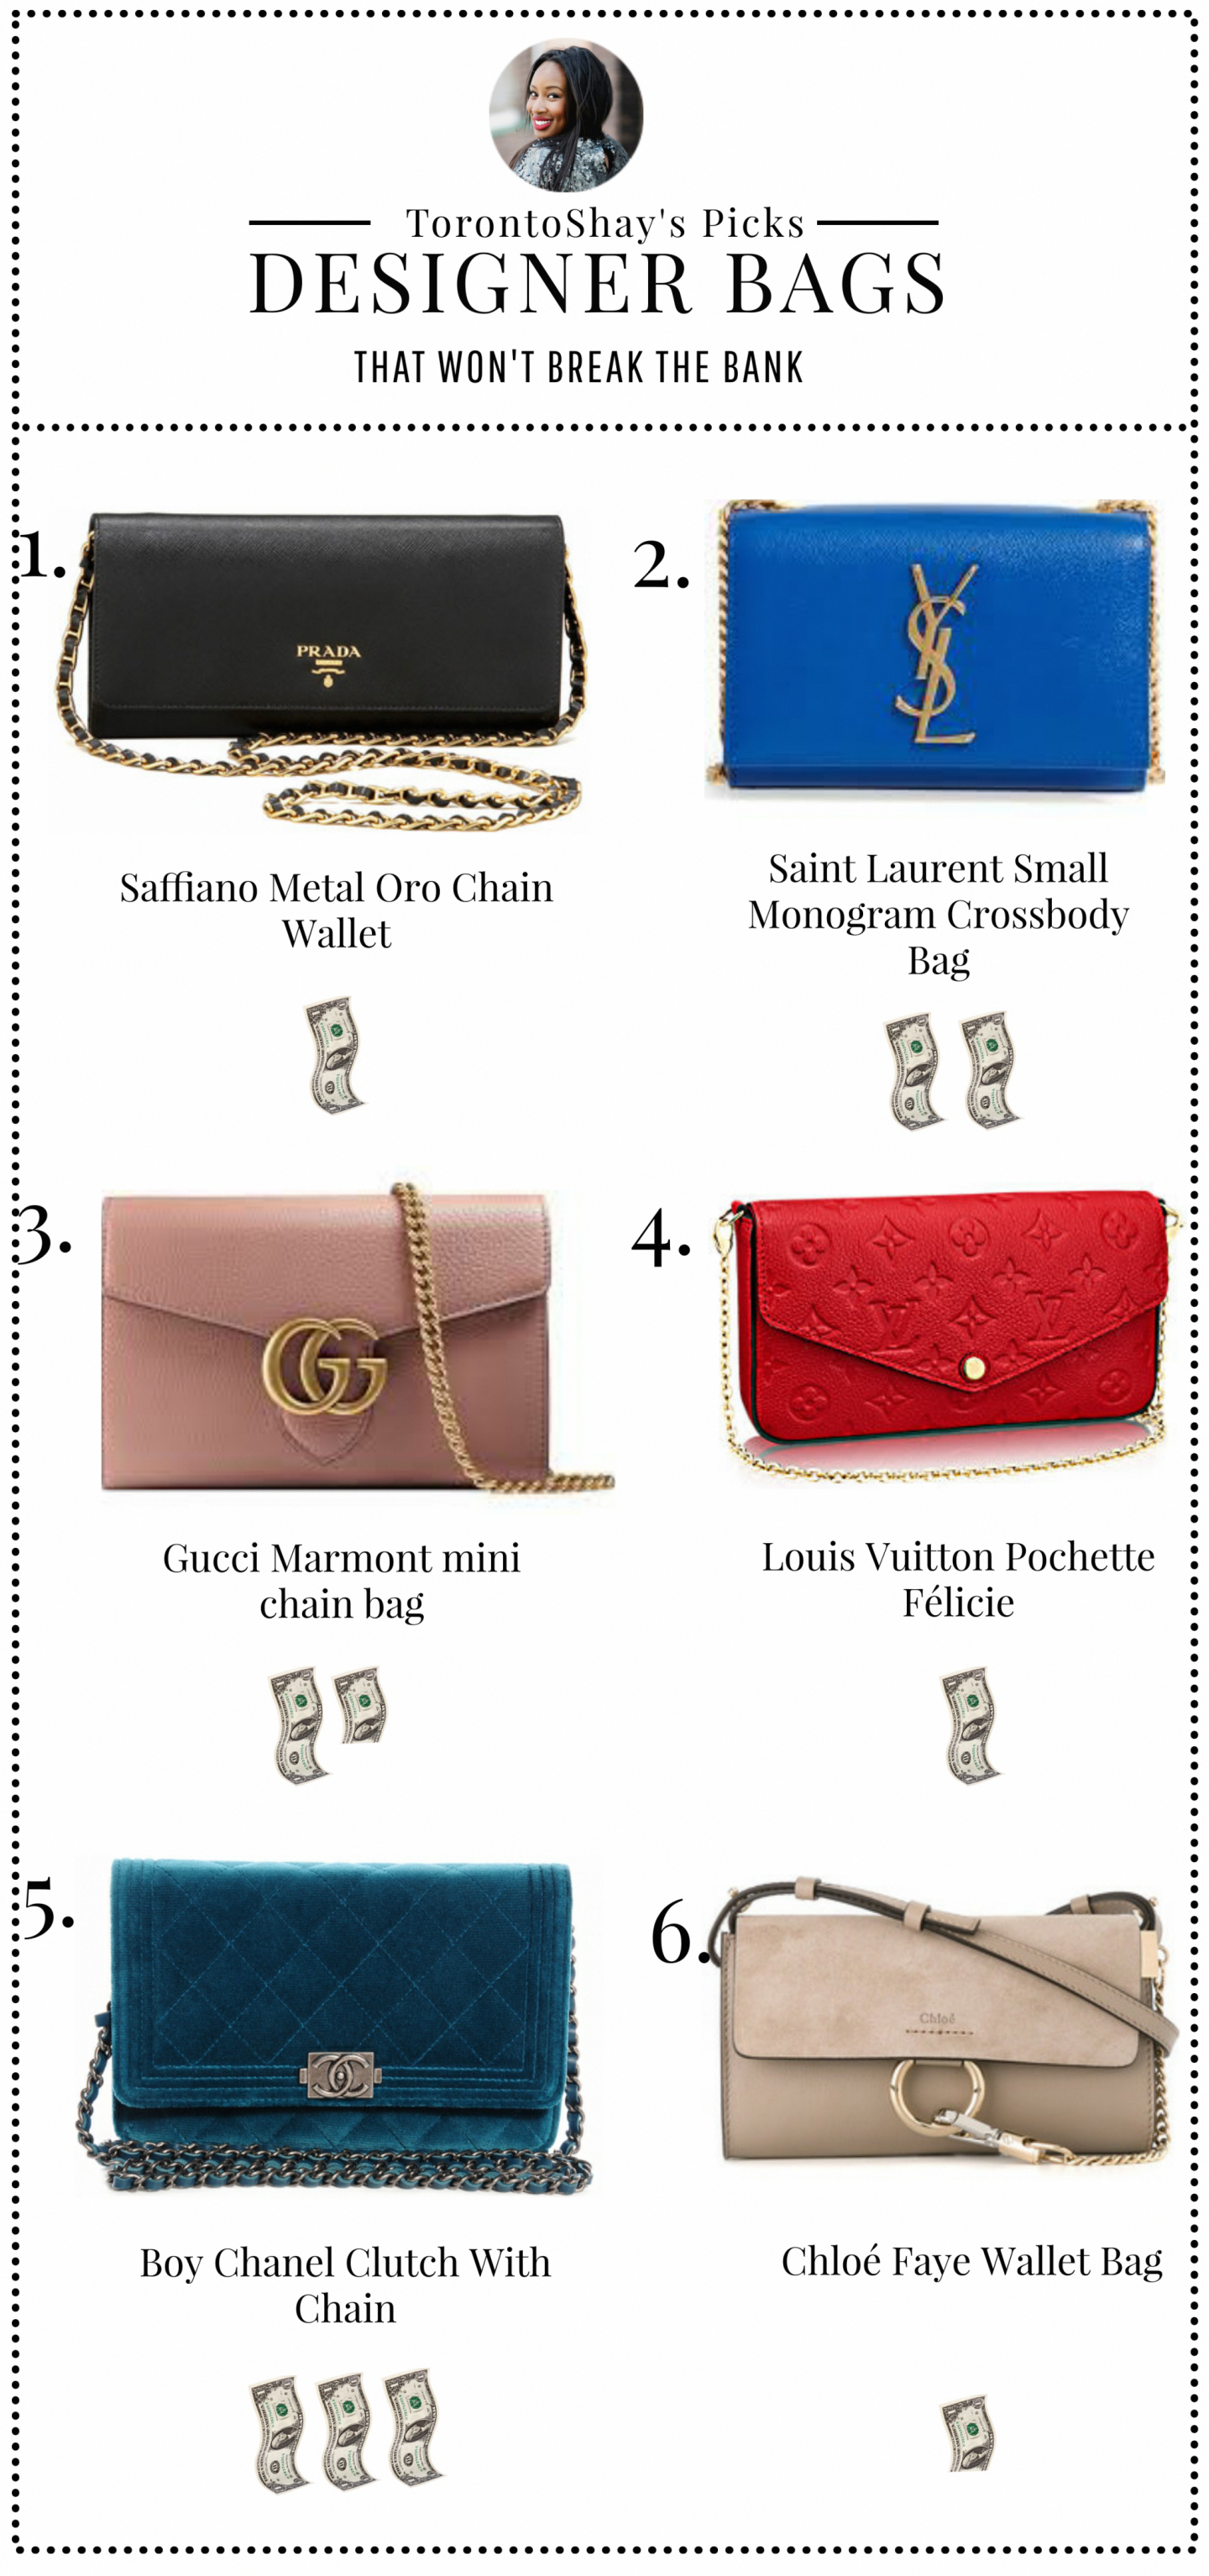 606b47a66e78 Affordable luxury handbags, designer bags, prada saffiano metal oro chain  wallet, saint laurent small monogram crossbody bab, gucci marmont mini chain  bag, ...